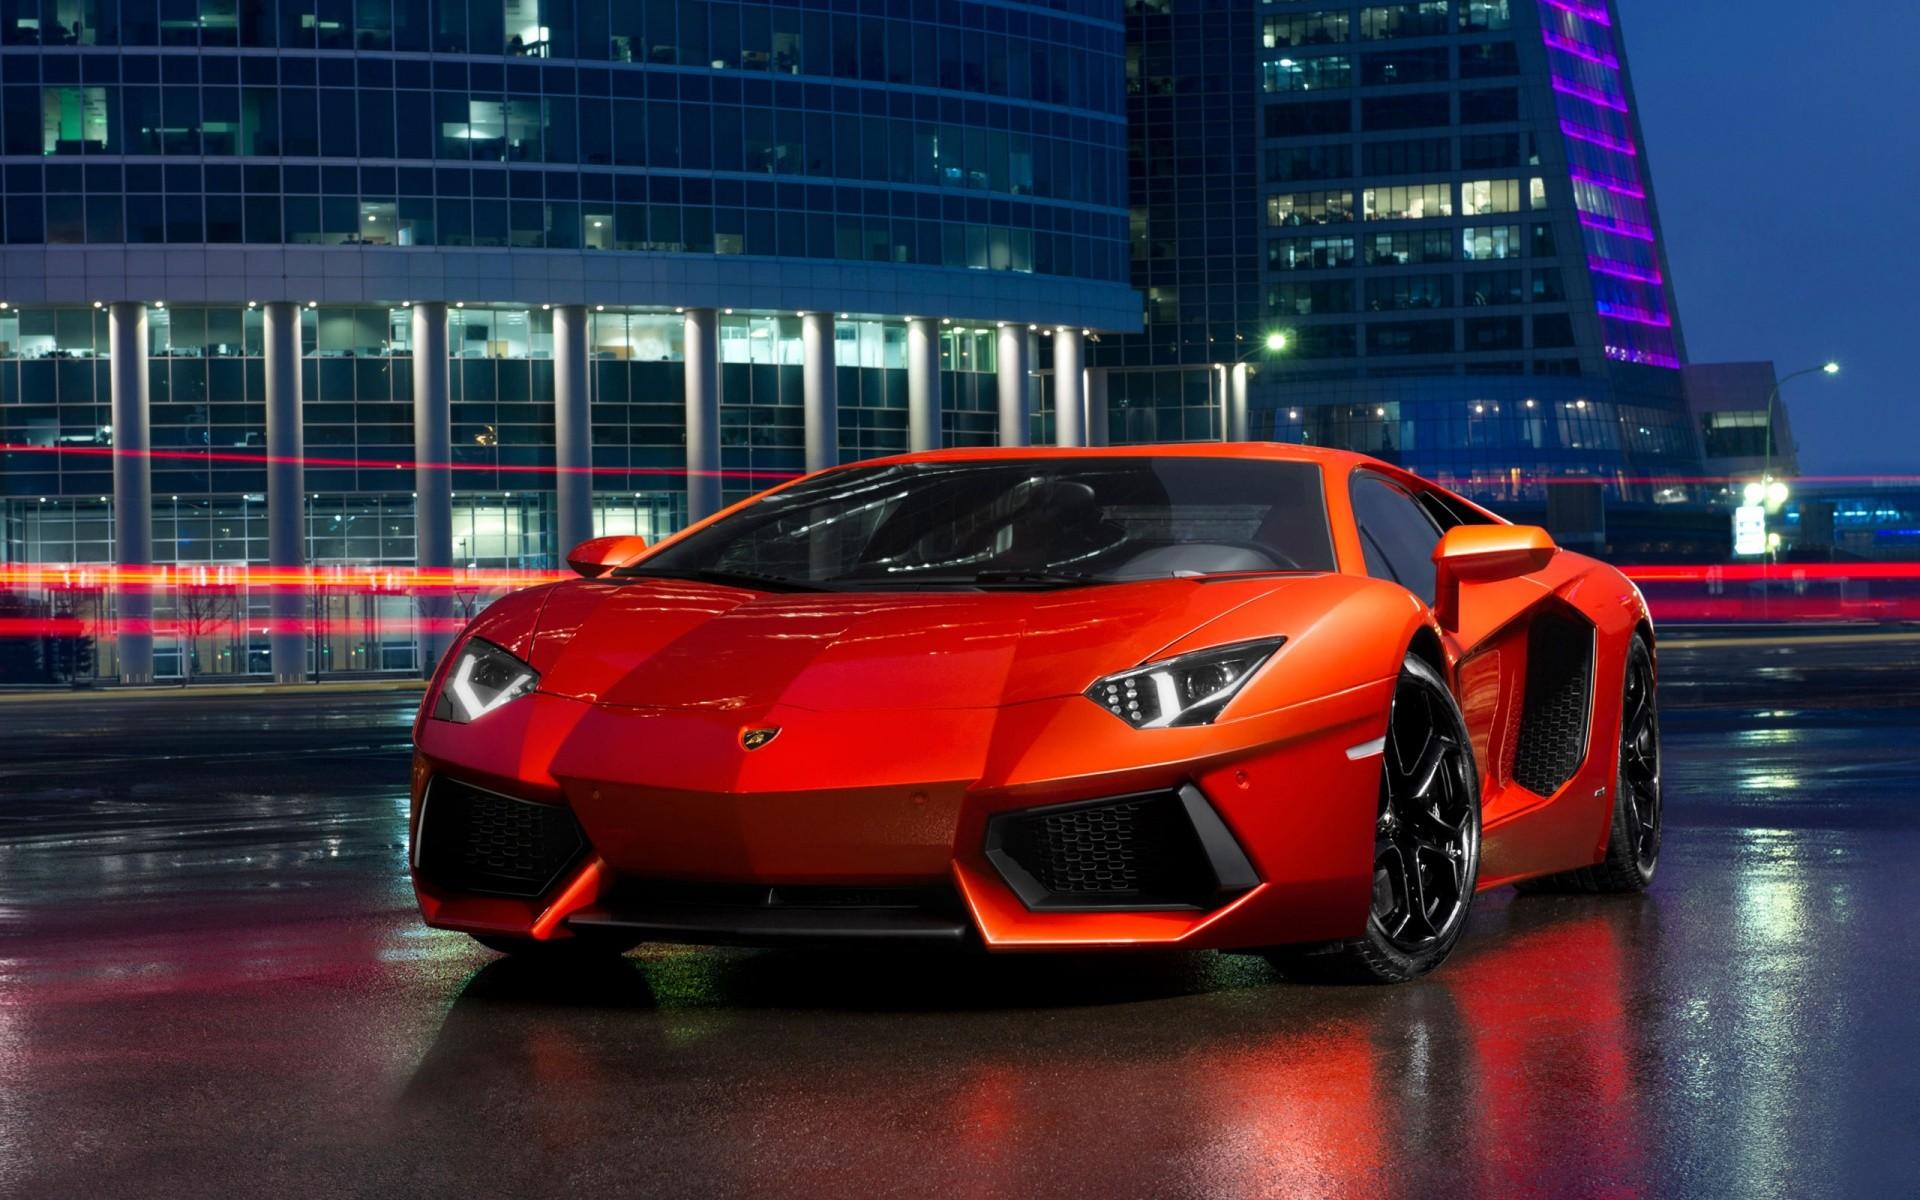 Res: 1920x1200, ... Red And Black Lamborghini Wallpaper #119